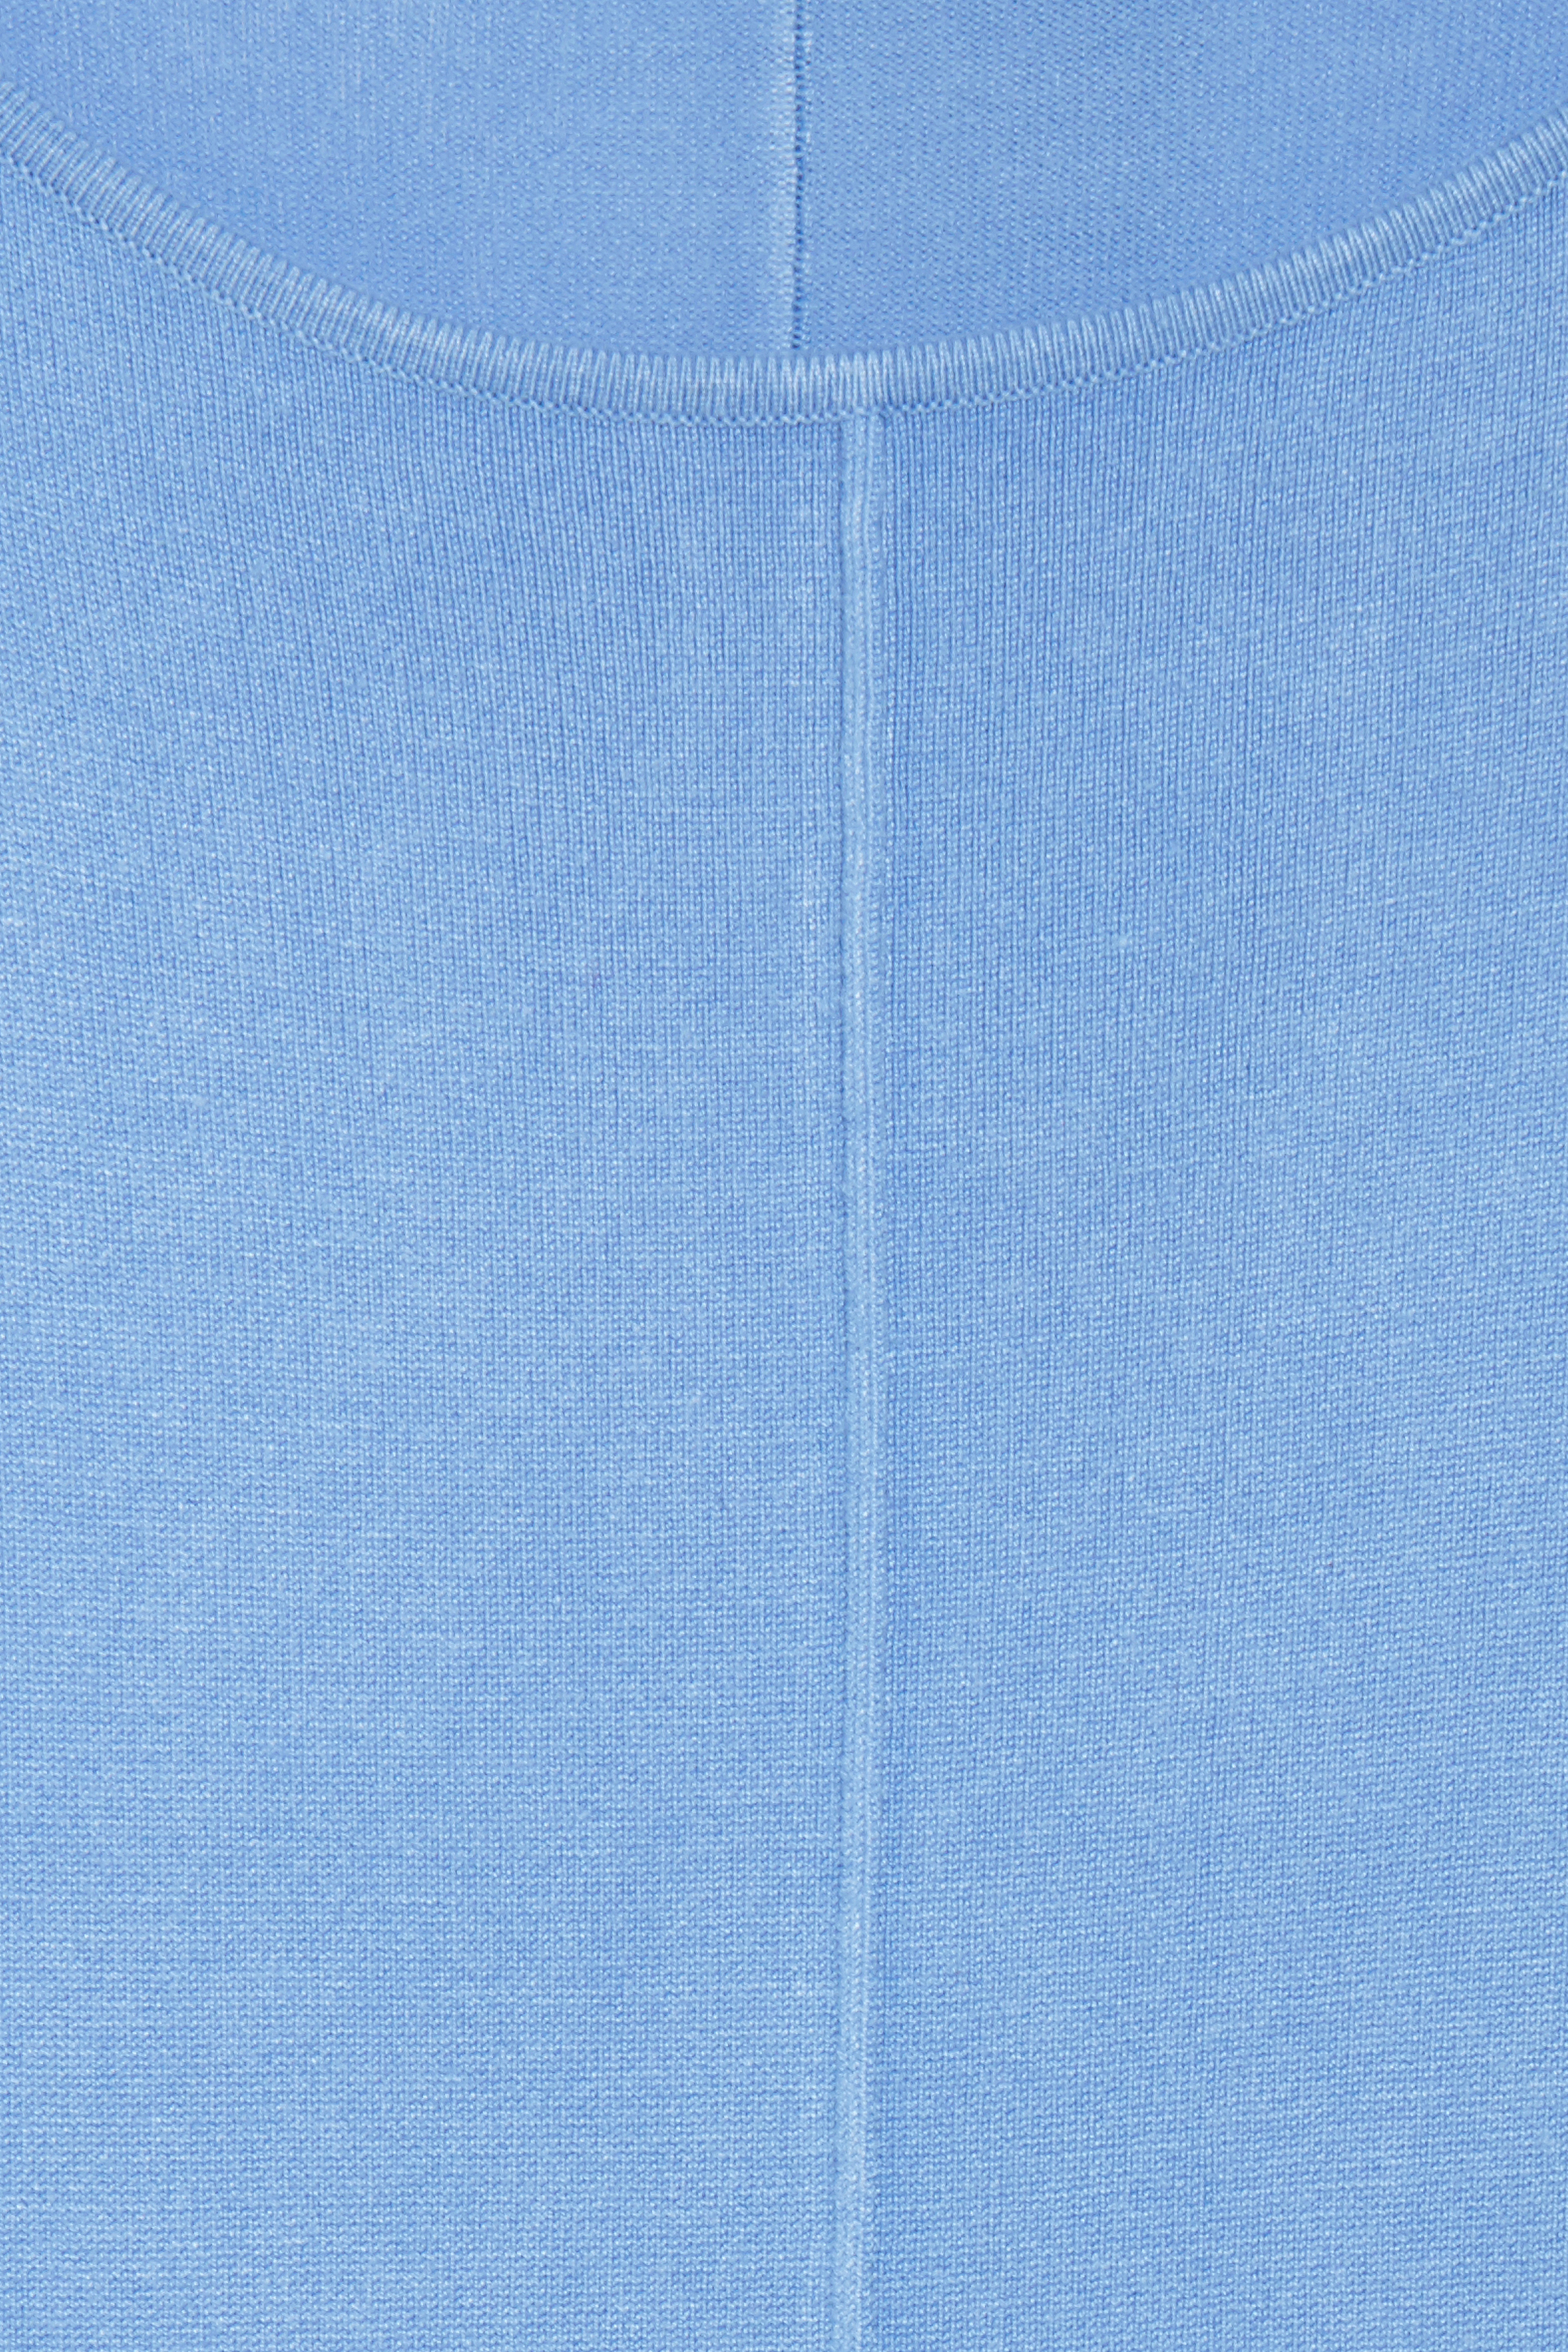 MEL. Cornflower Blue Strikpullover fra b.young – Køb MEL. Cornflower Blue Strikpullover fra str. XS-XXL her